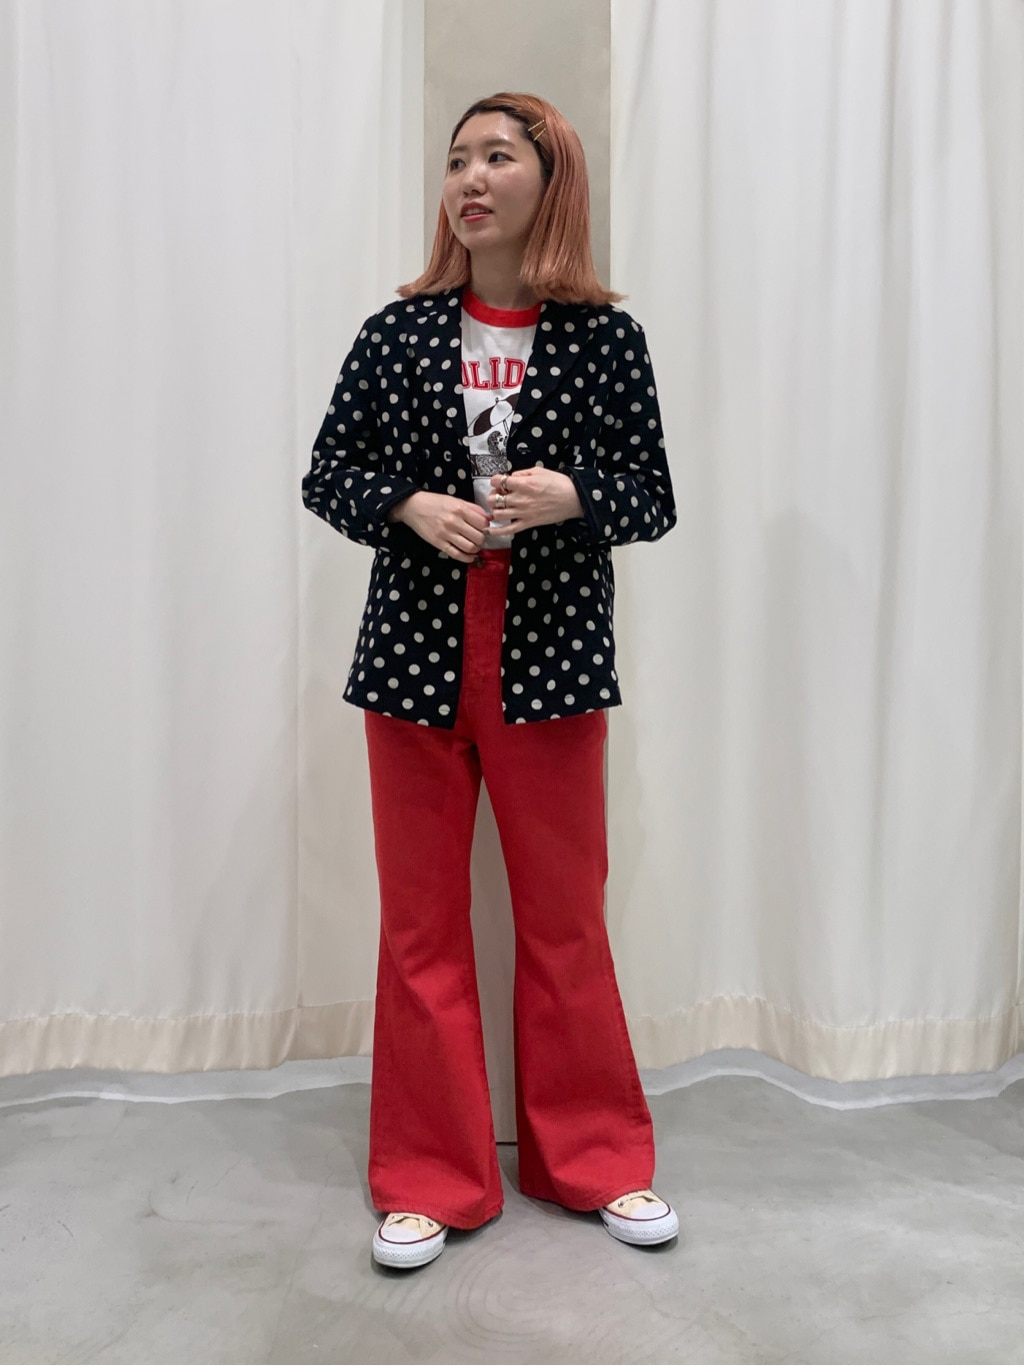 CHILD WOMAN , PAR ICI 東京スカイツリータウン・ソラマチ 2021.05.20